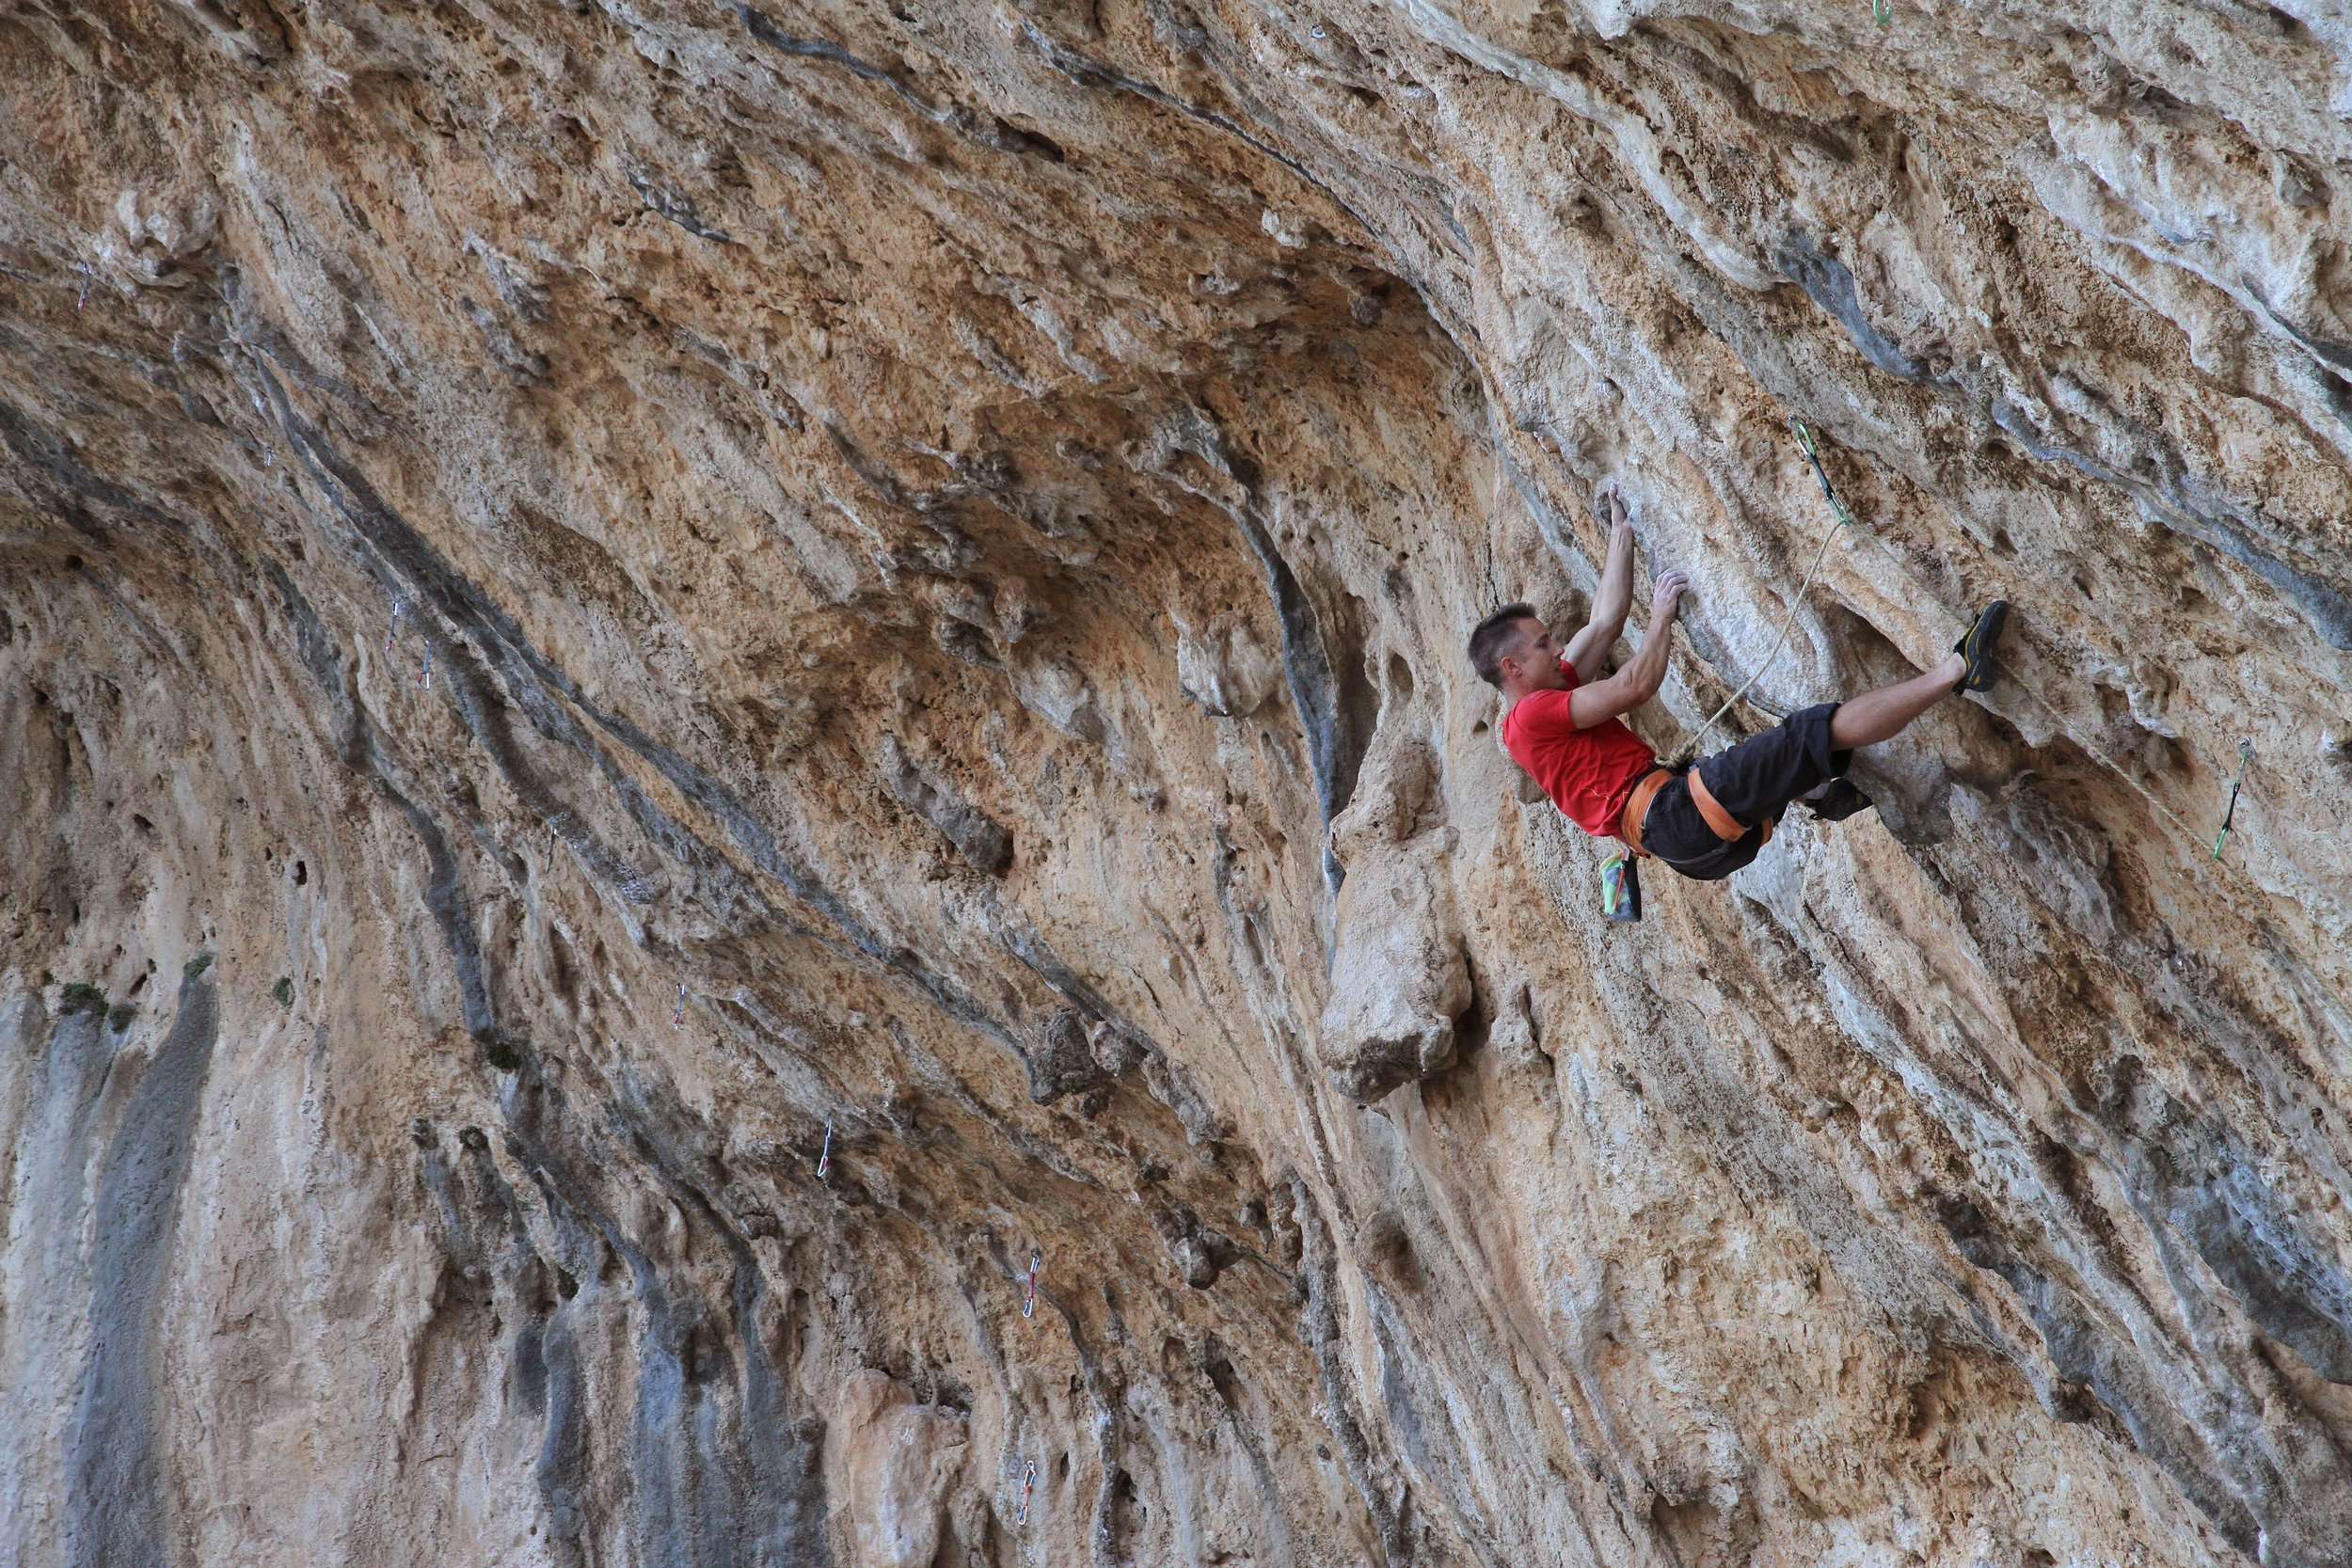 Tyrant 8a/+, ET Cave, Kalymnos.  Photo: Simon Kincaid